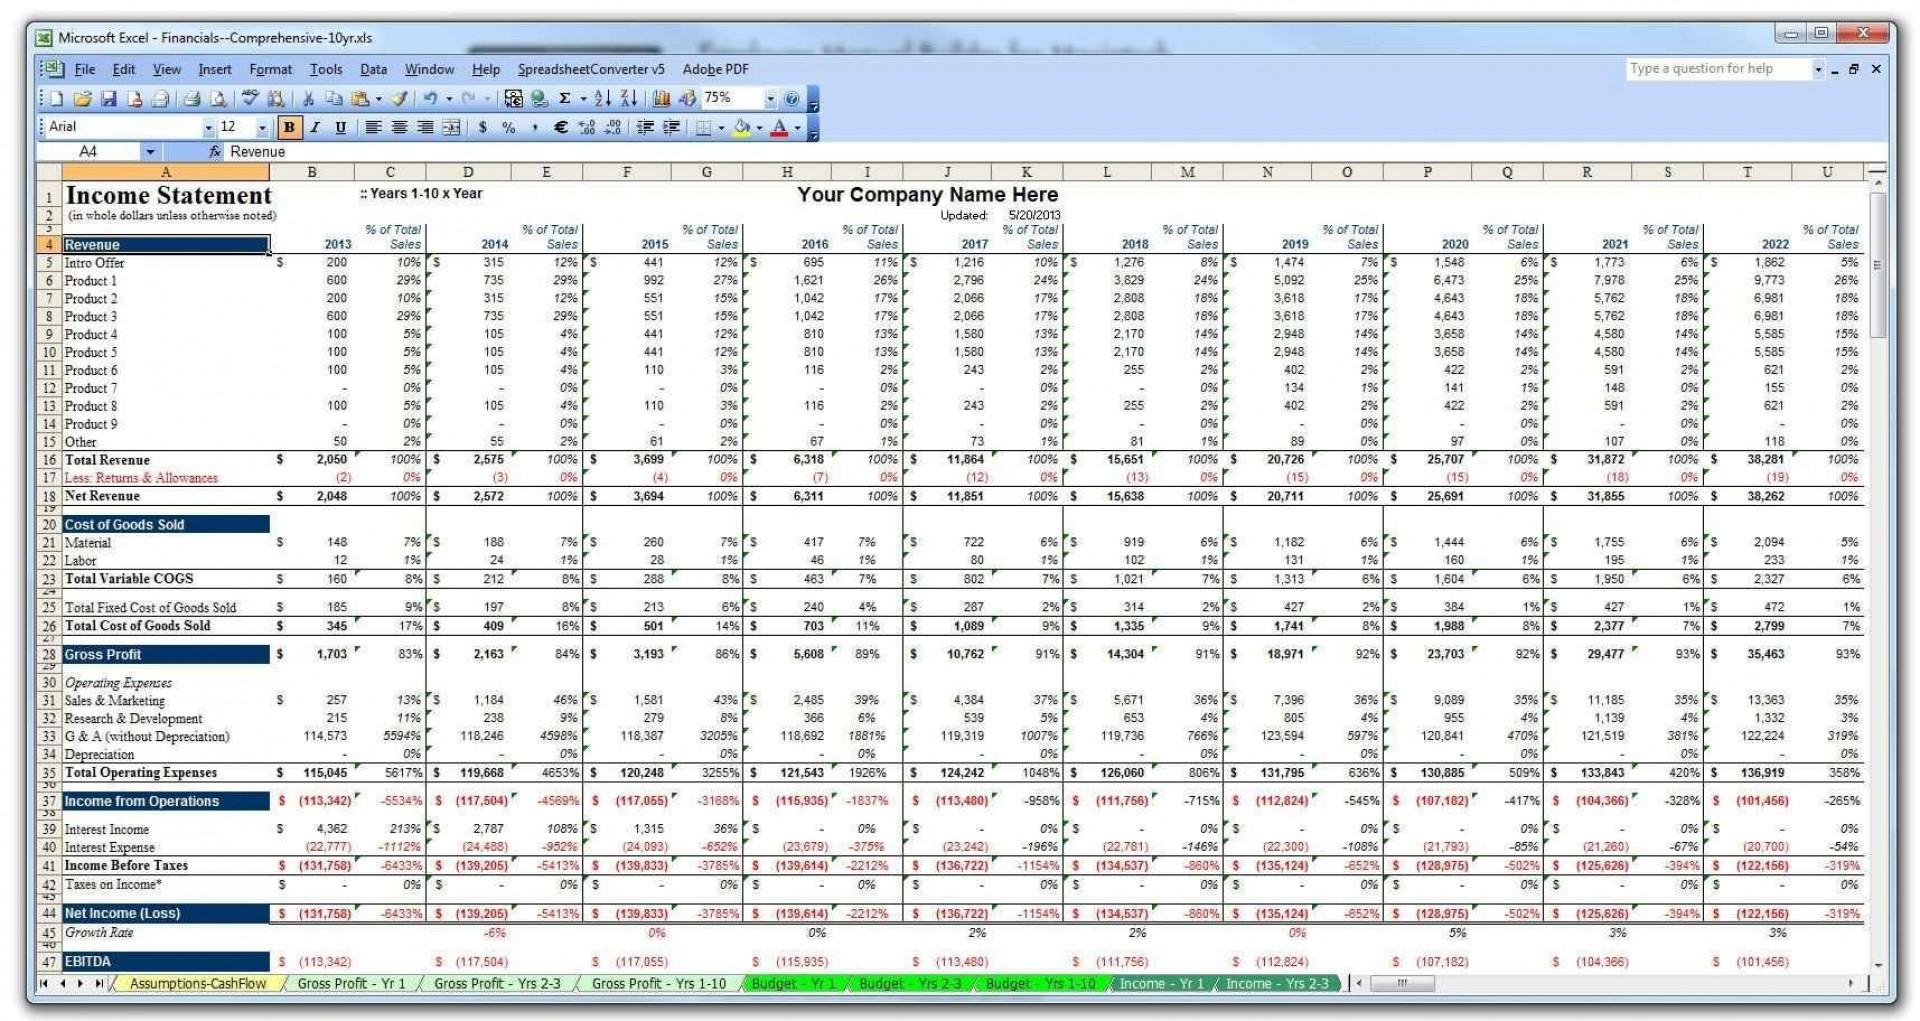 002 Unusual Financial Plan Template Excel Image  Strategic Busines Simple1920